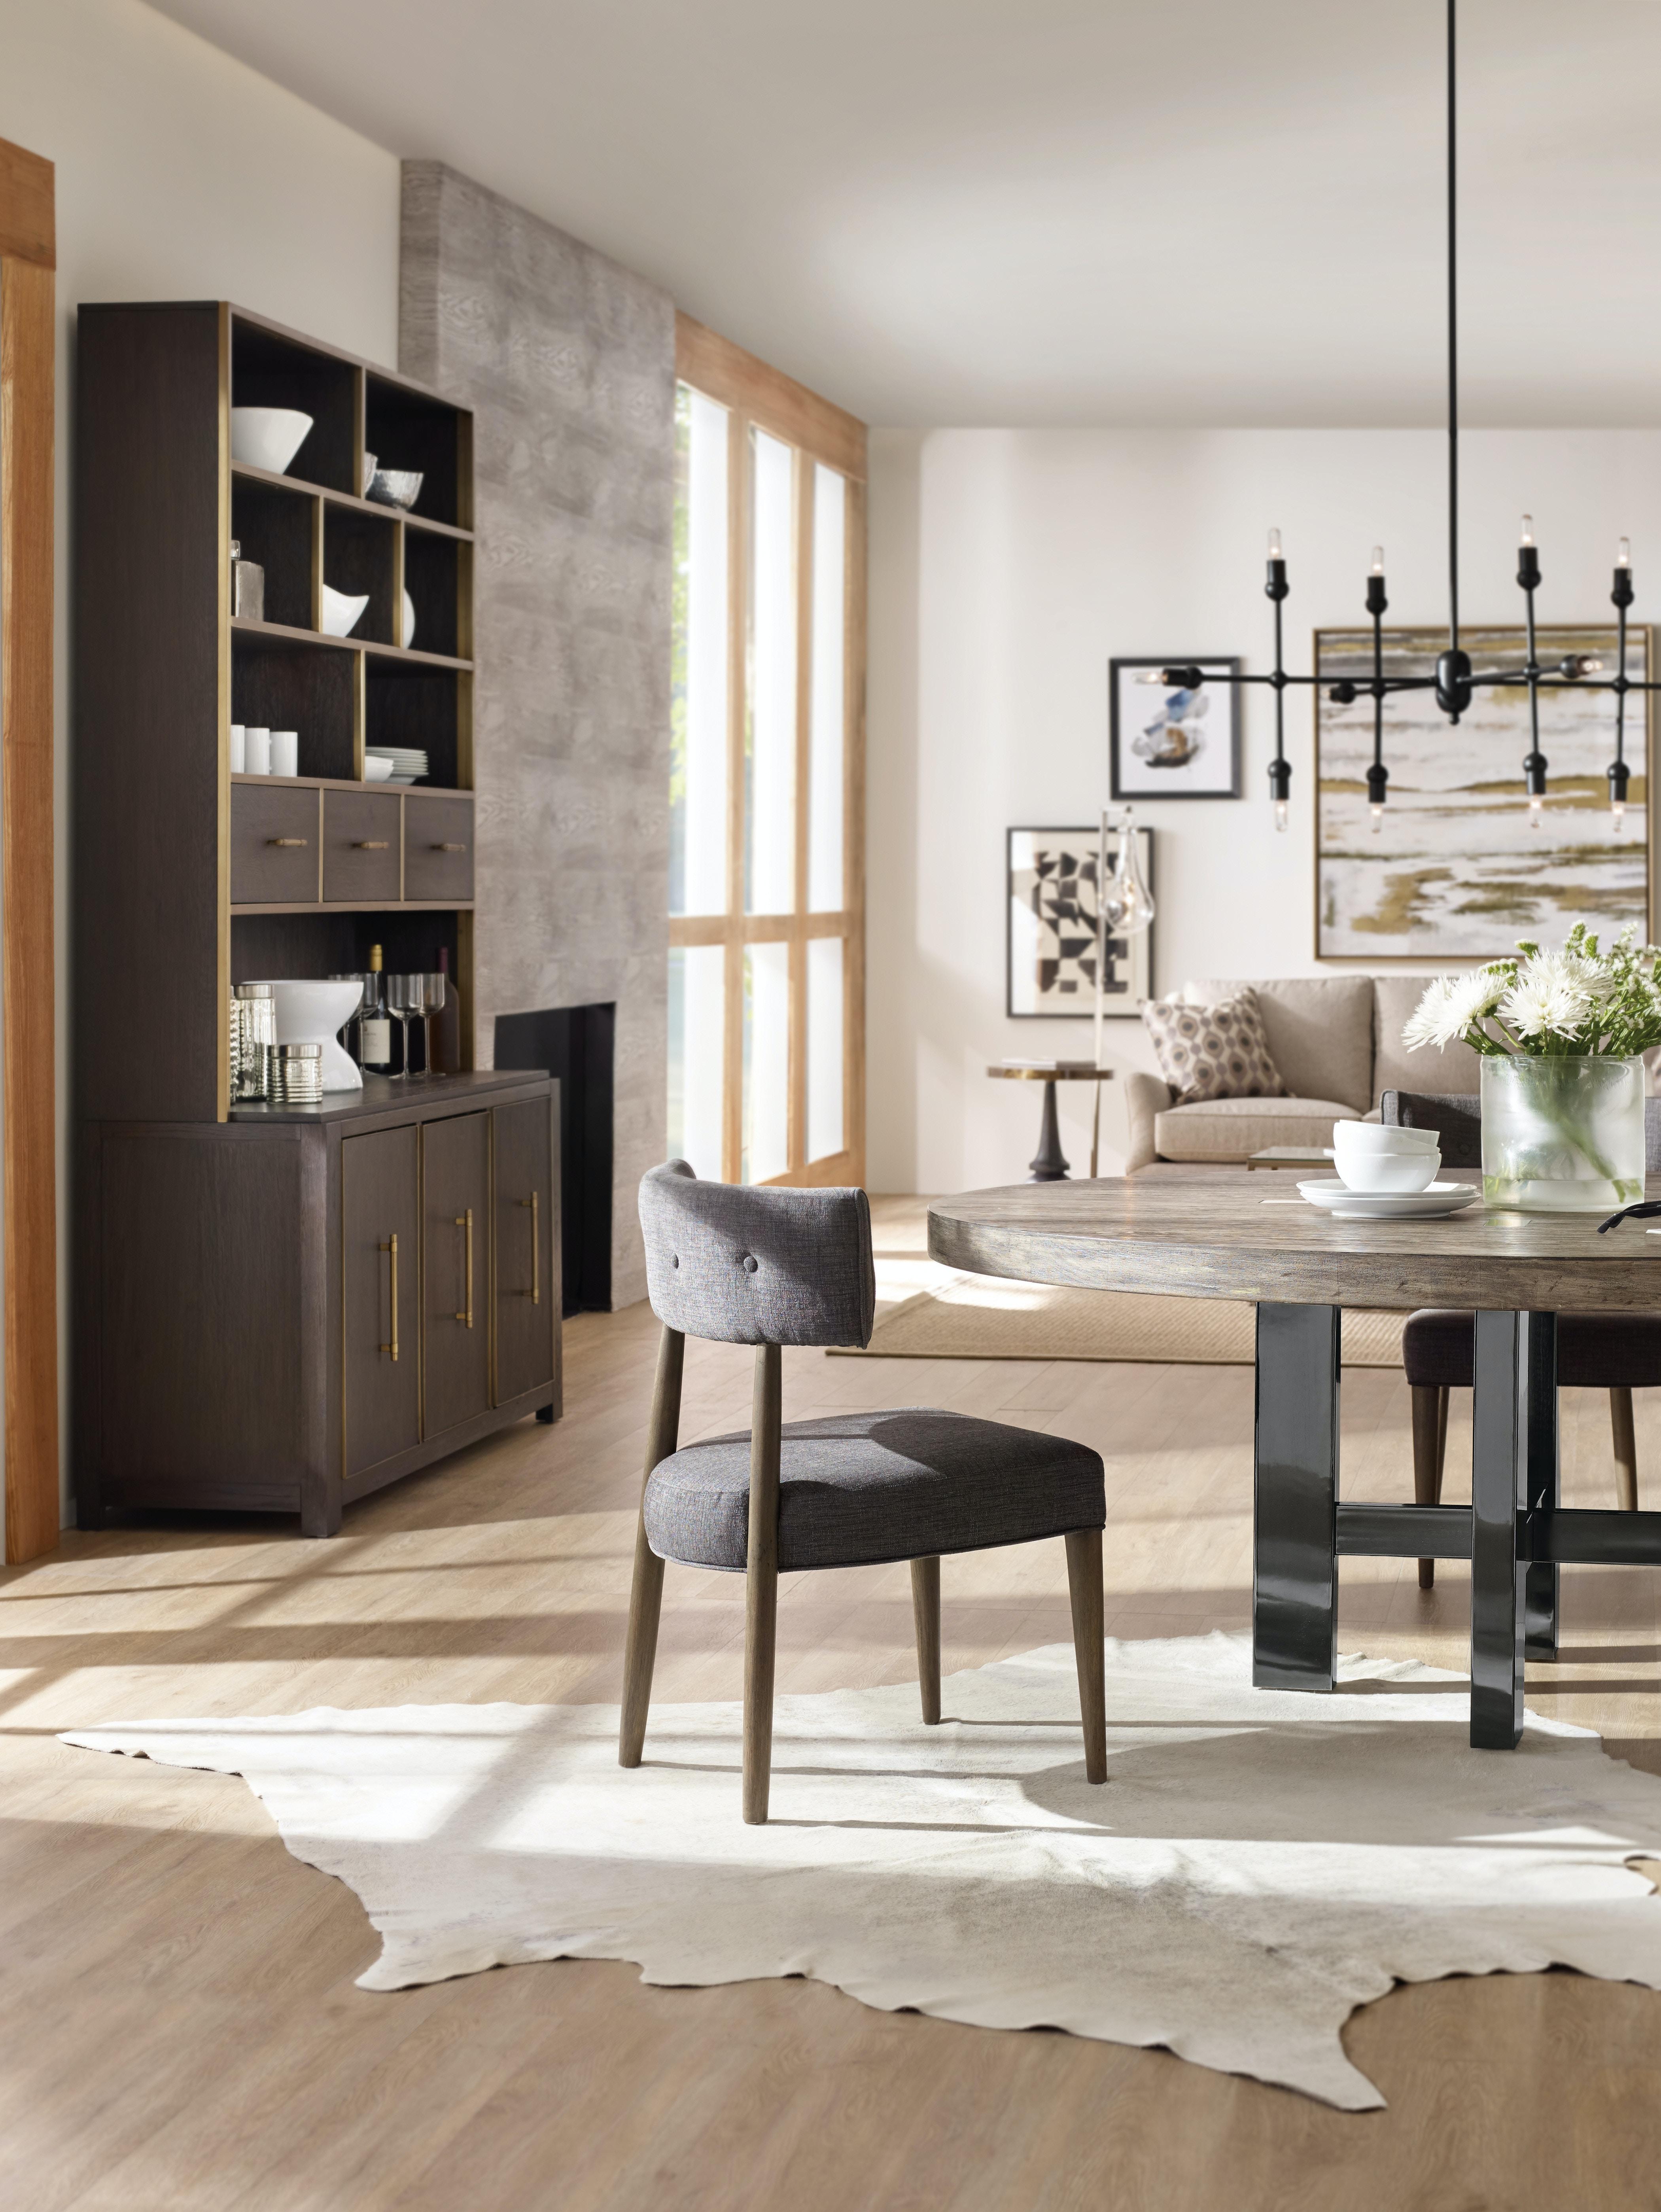 Hooker Furniture Curata Buffet/Credenza 1600 75900 DKW